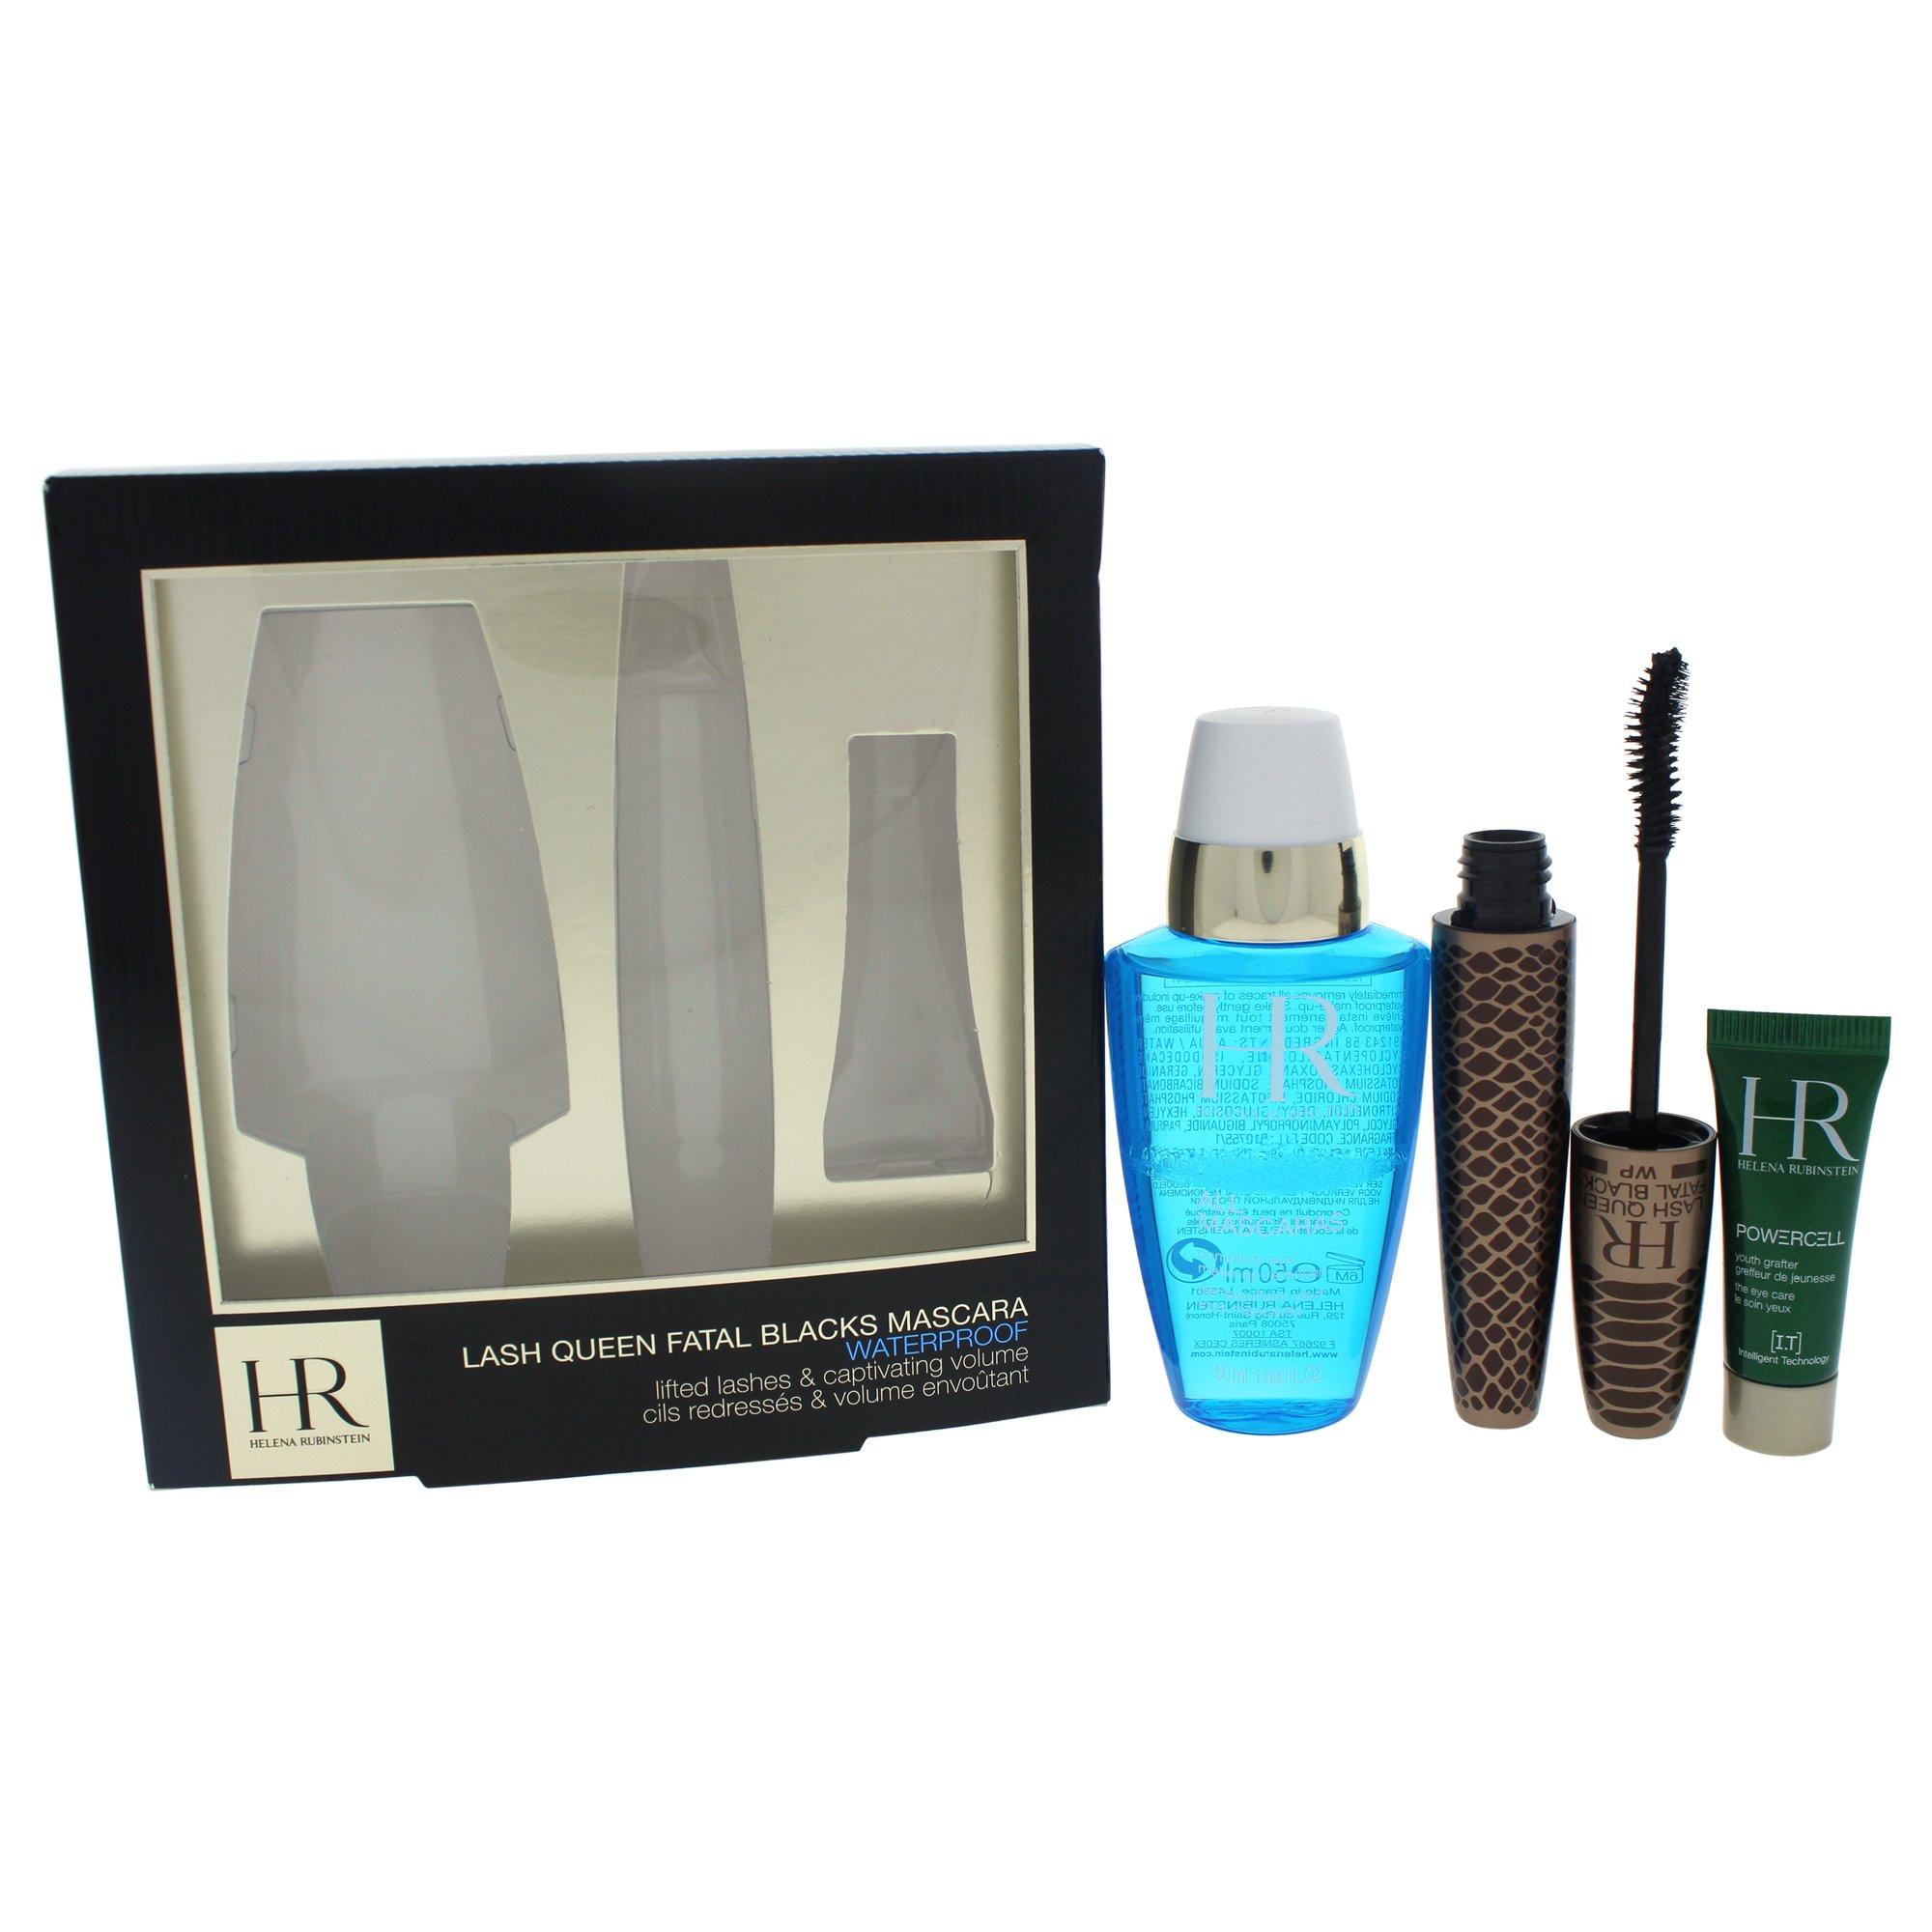 Helena Rubinstein Lash Queen Fatal Black Mascara Waterproof Kit for Women, 3 Count by Helena Rubinstein (Image #1)